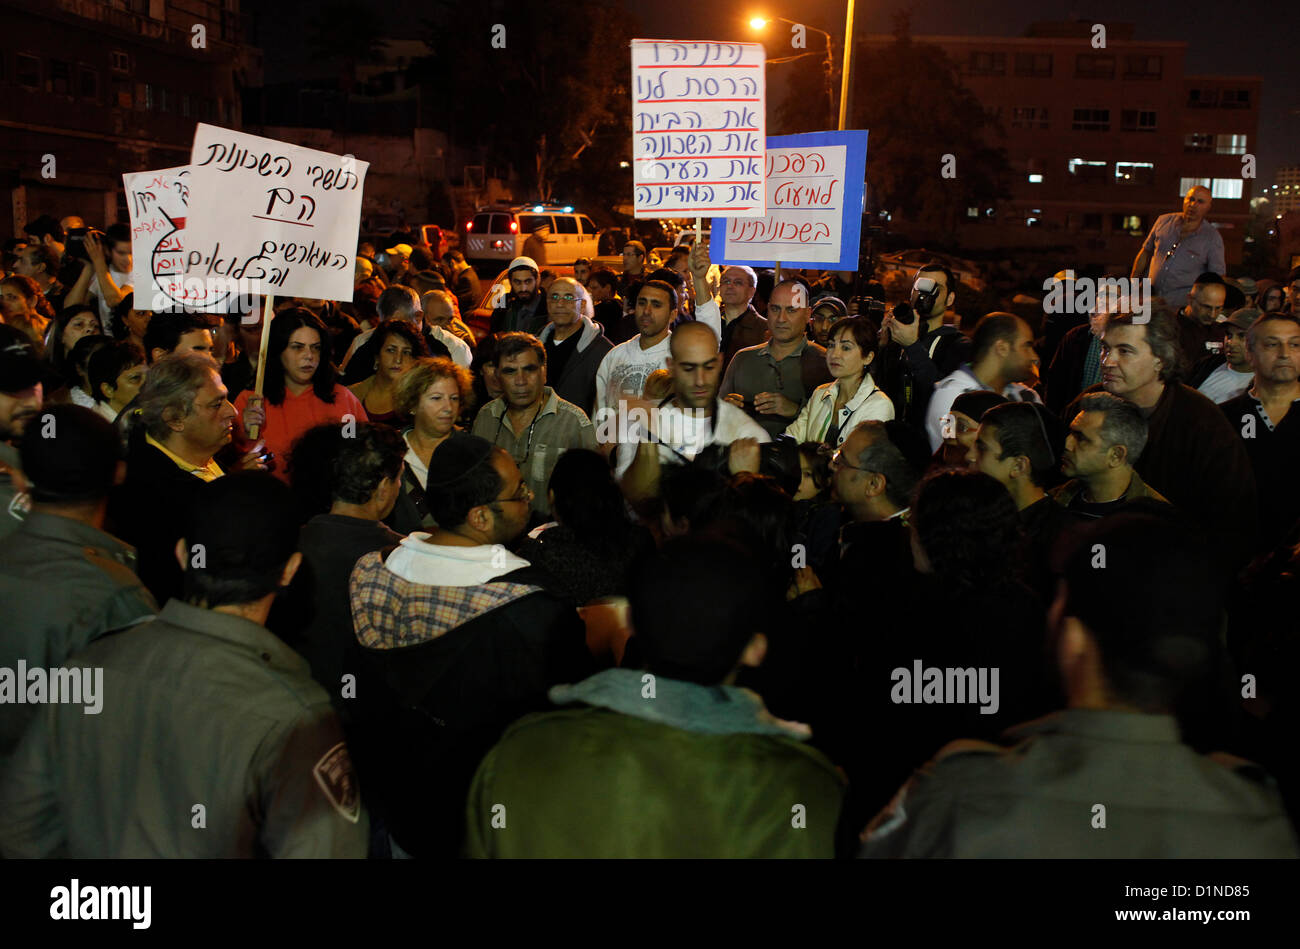 Israeli border policemen blocking anti migrant protesters in Tel Aviv in response to publication of an incident - Stock Image